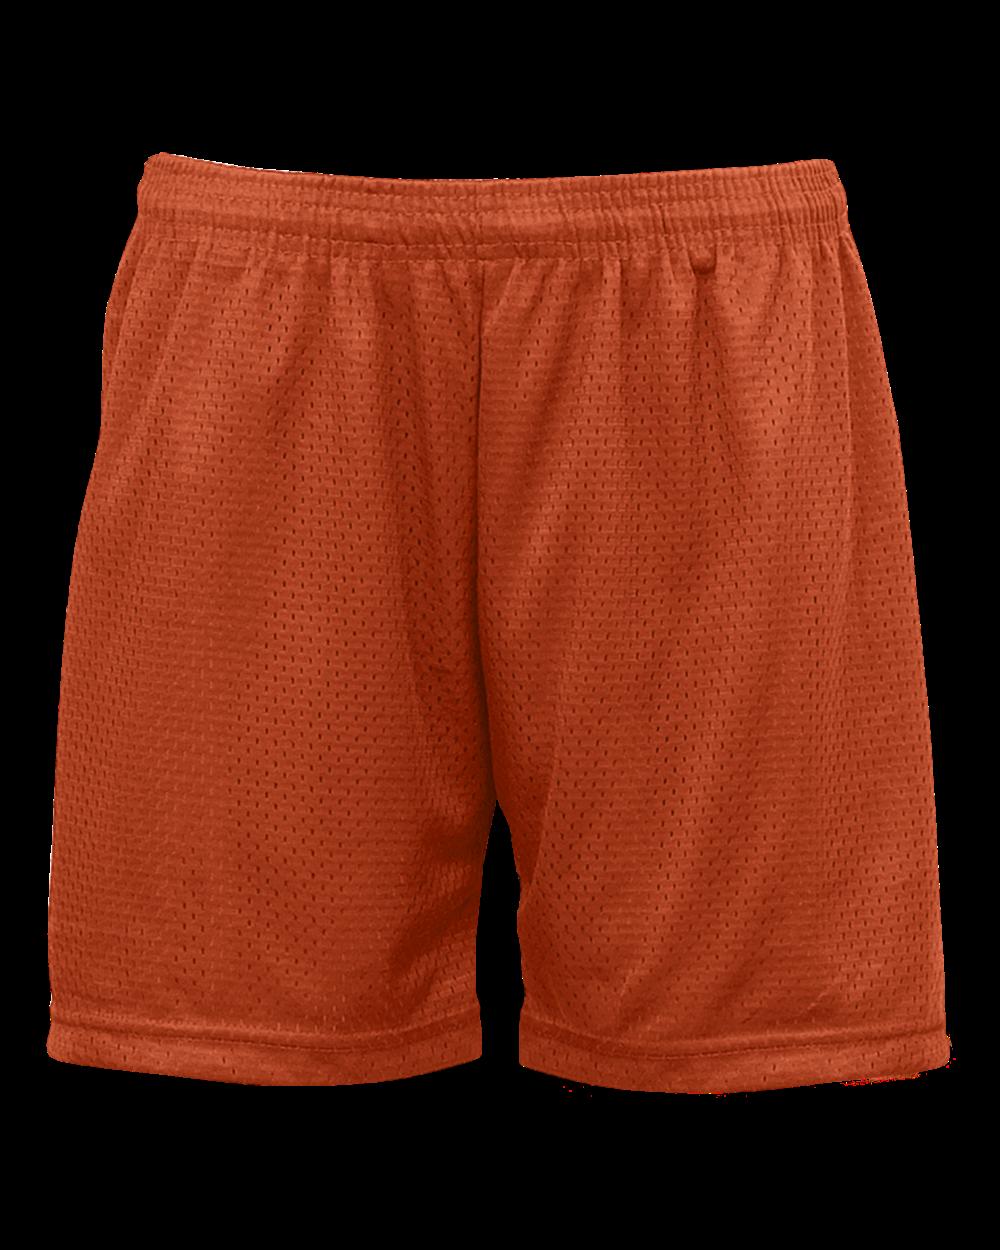 Mesh/Tricot Women's Short - Burnt Orange